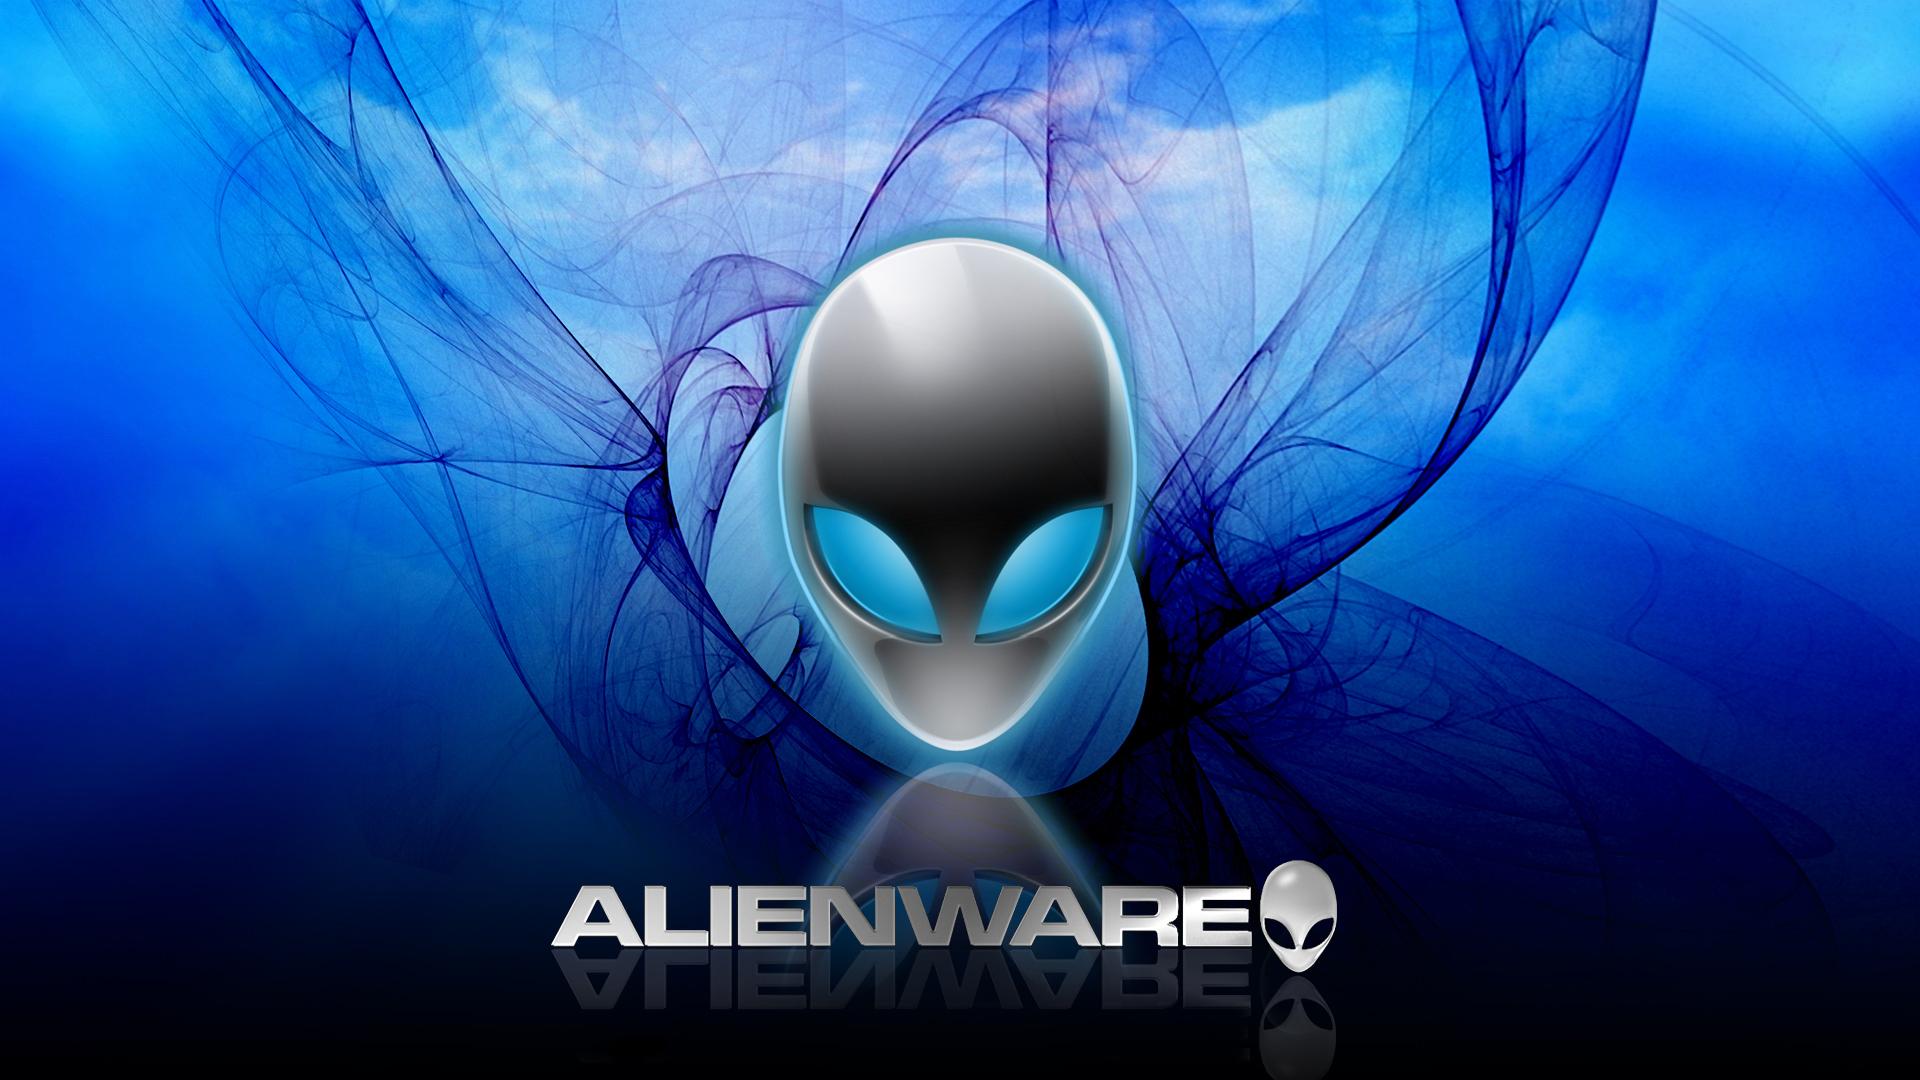 Hipster Fall Desktop Wallpaper Alienware Wallpapers Hd Pixelstalk Net